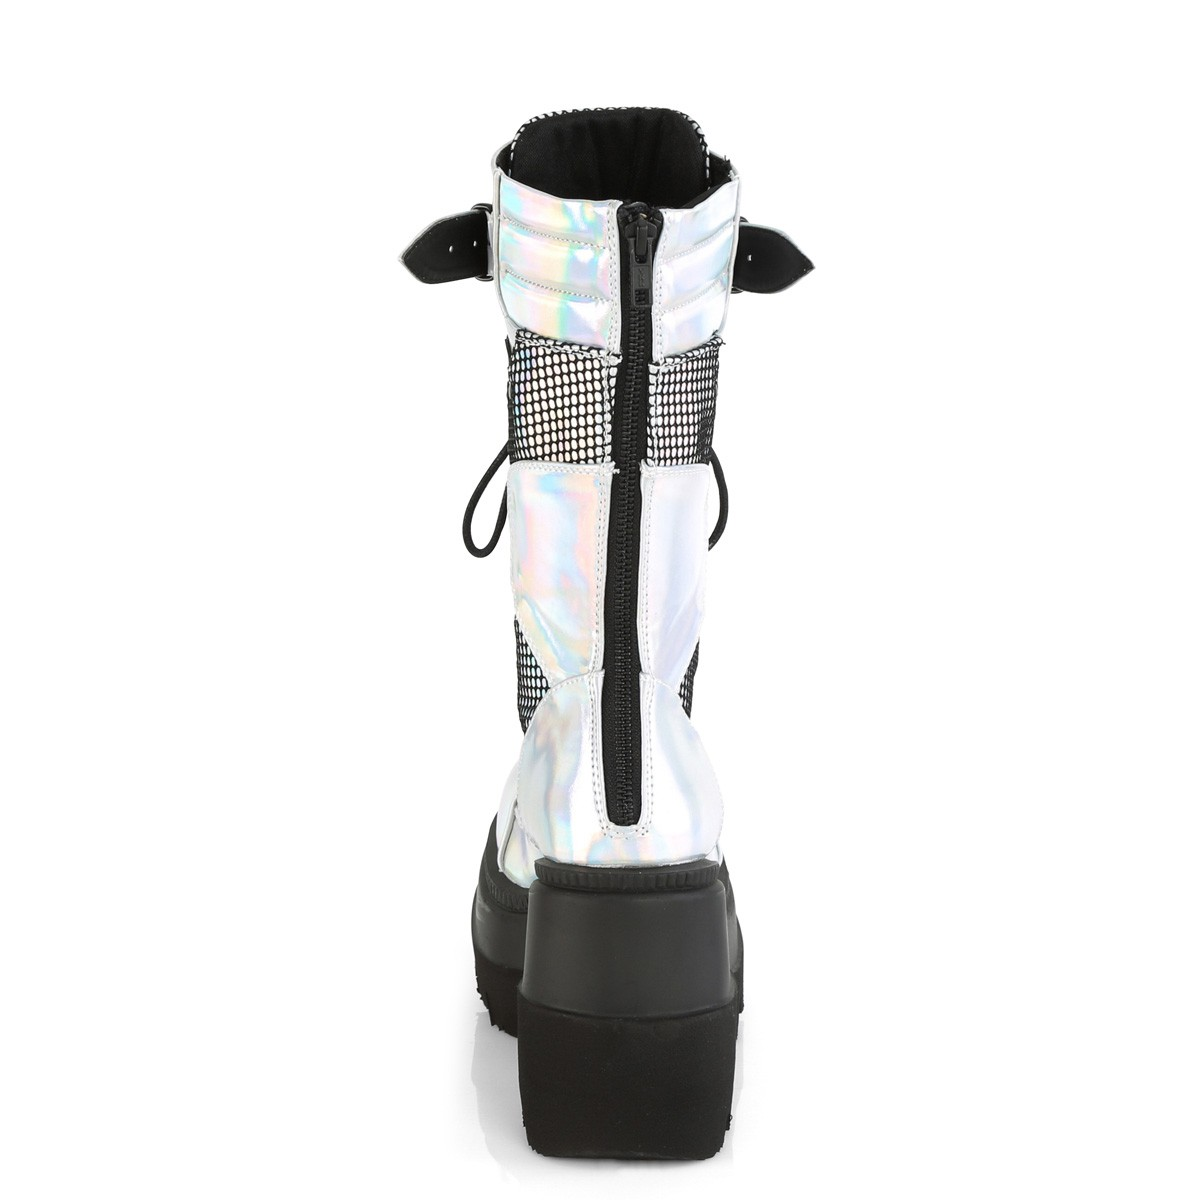 Bota Shaker 70 Prata Cano Médio - Demonia (encomenda)